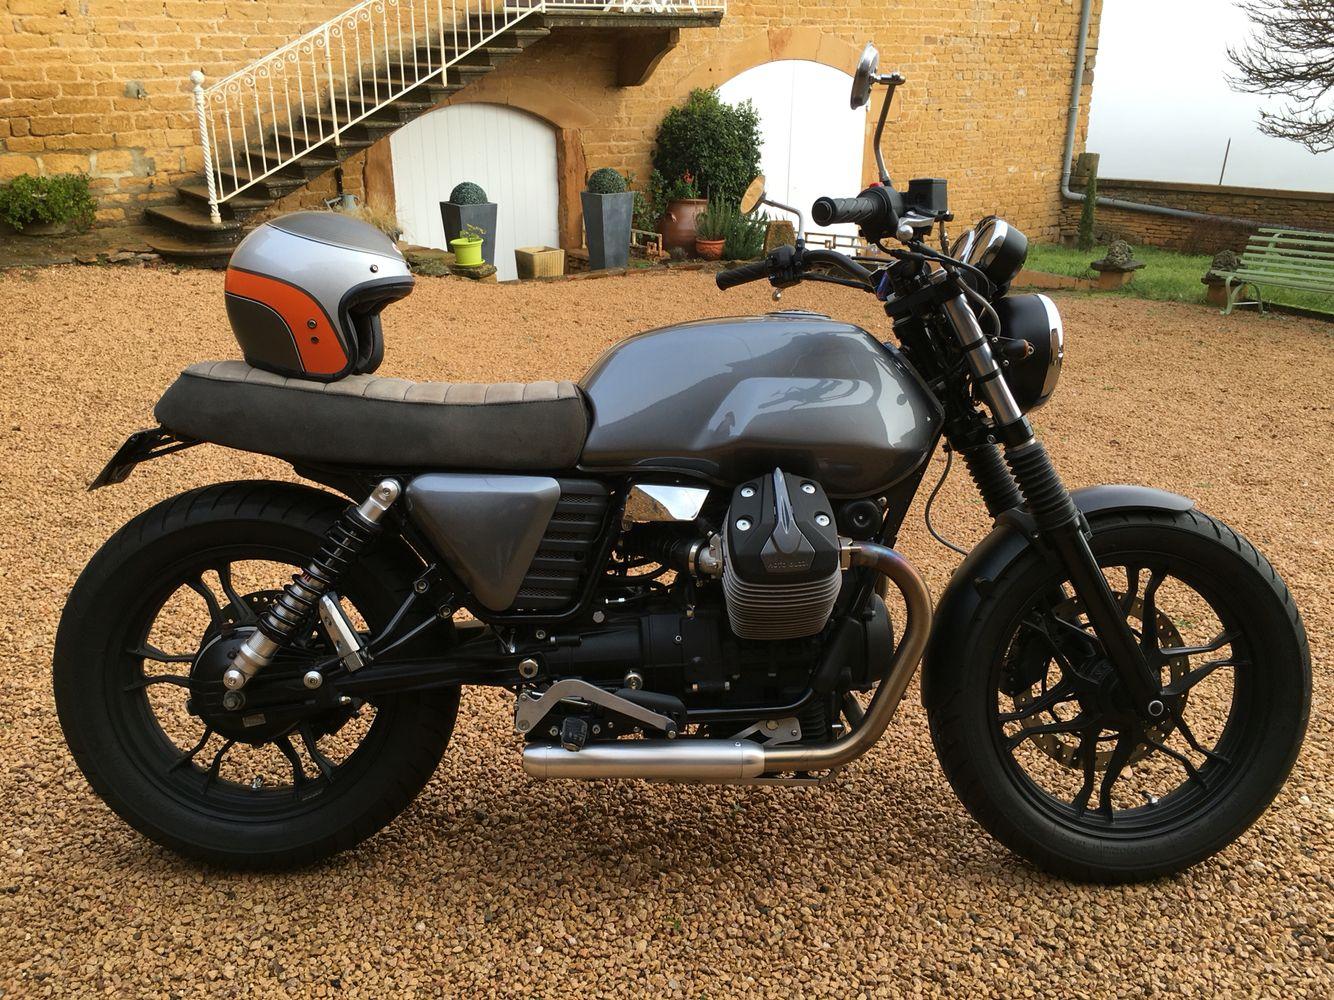 moto guzzi v7 baak custom bikes motorrad. Black Bedroom Furniture Sets. Home Design Ideas